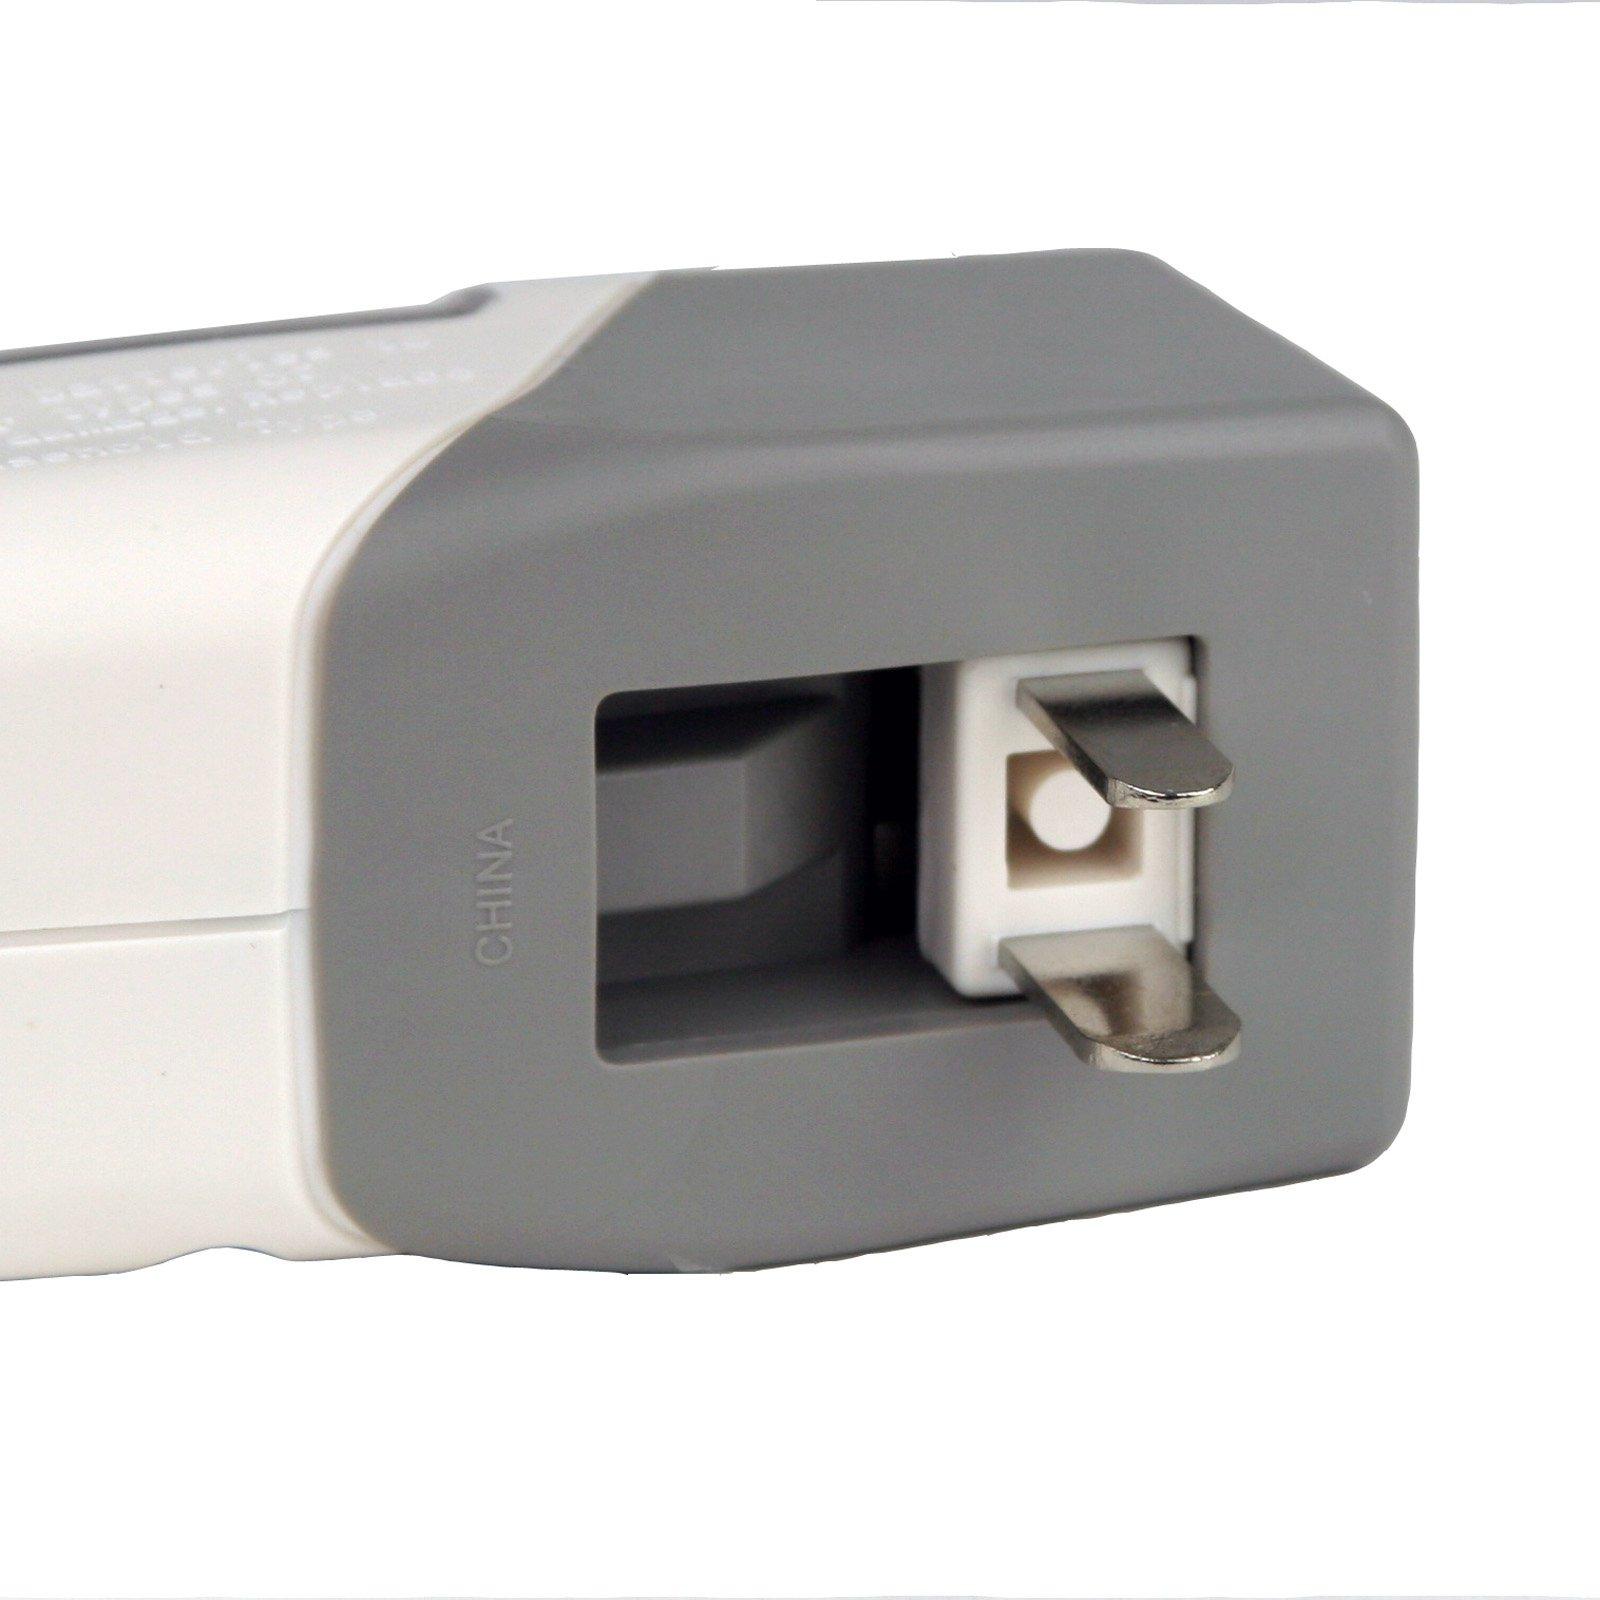 Dorcy 41 1032 LED Rechargeable Flashlight/Area light